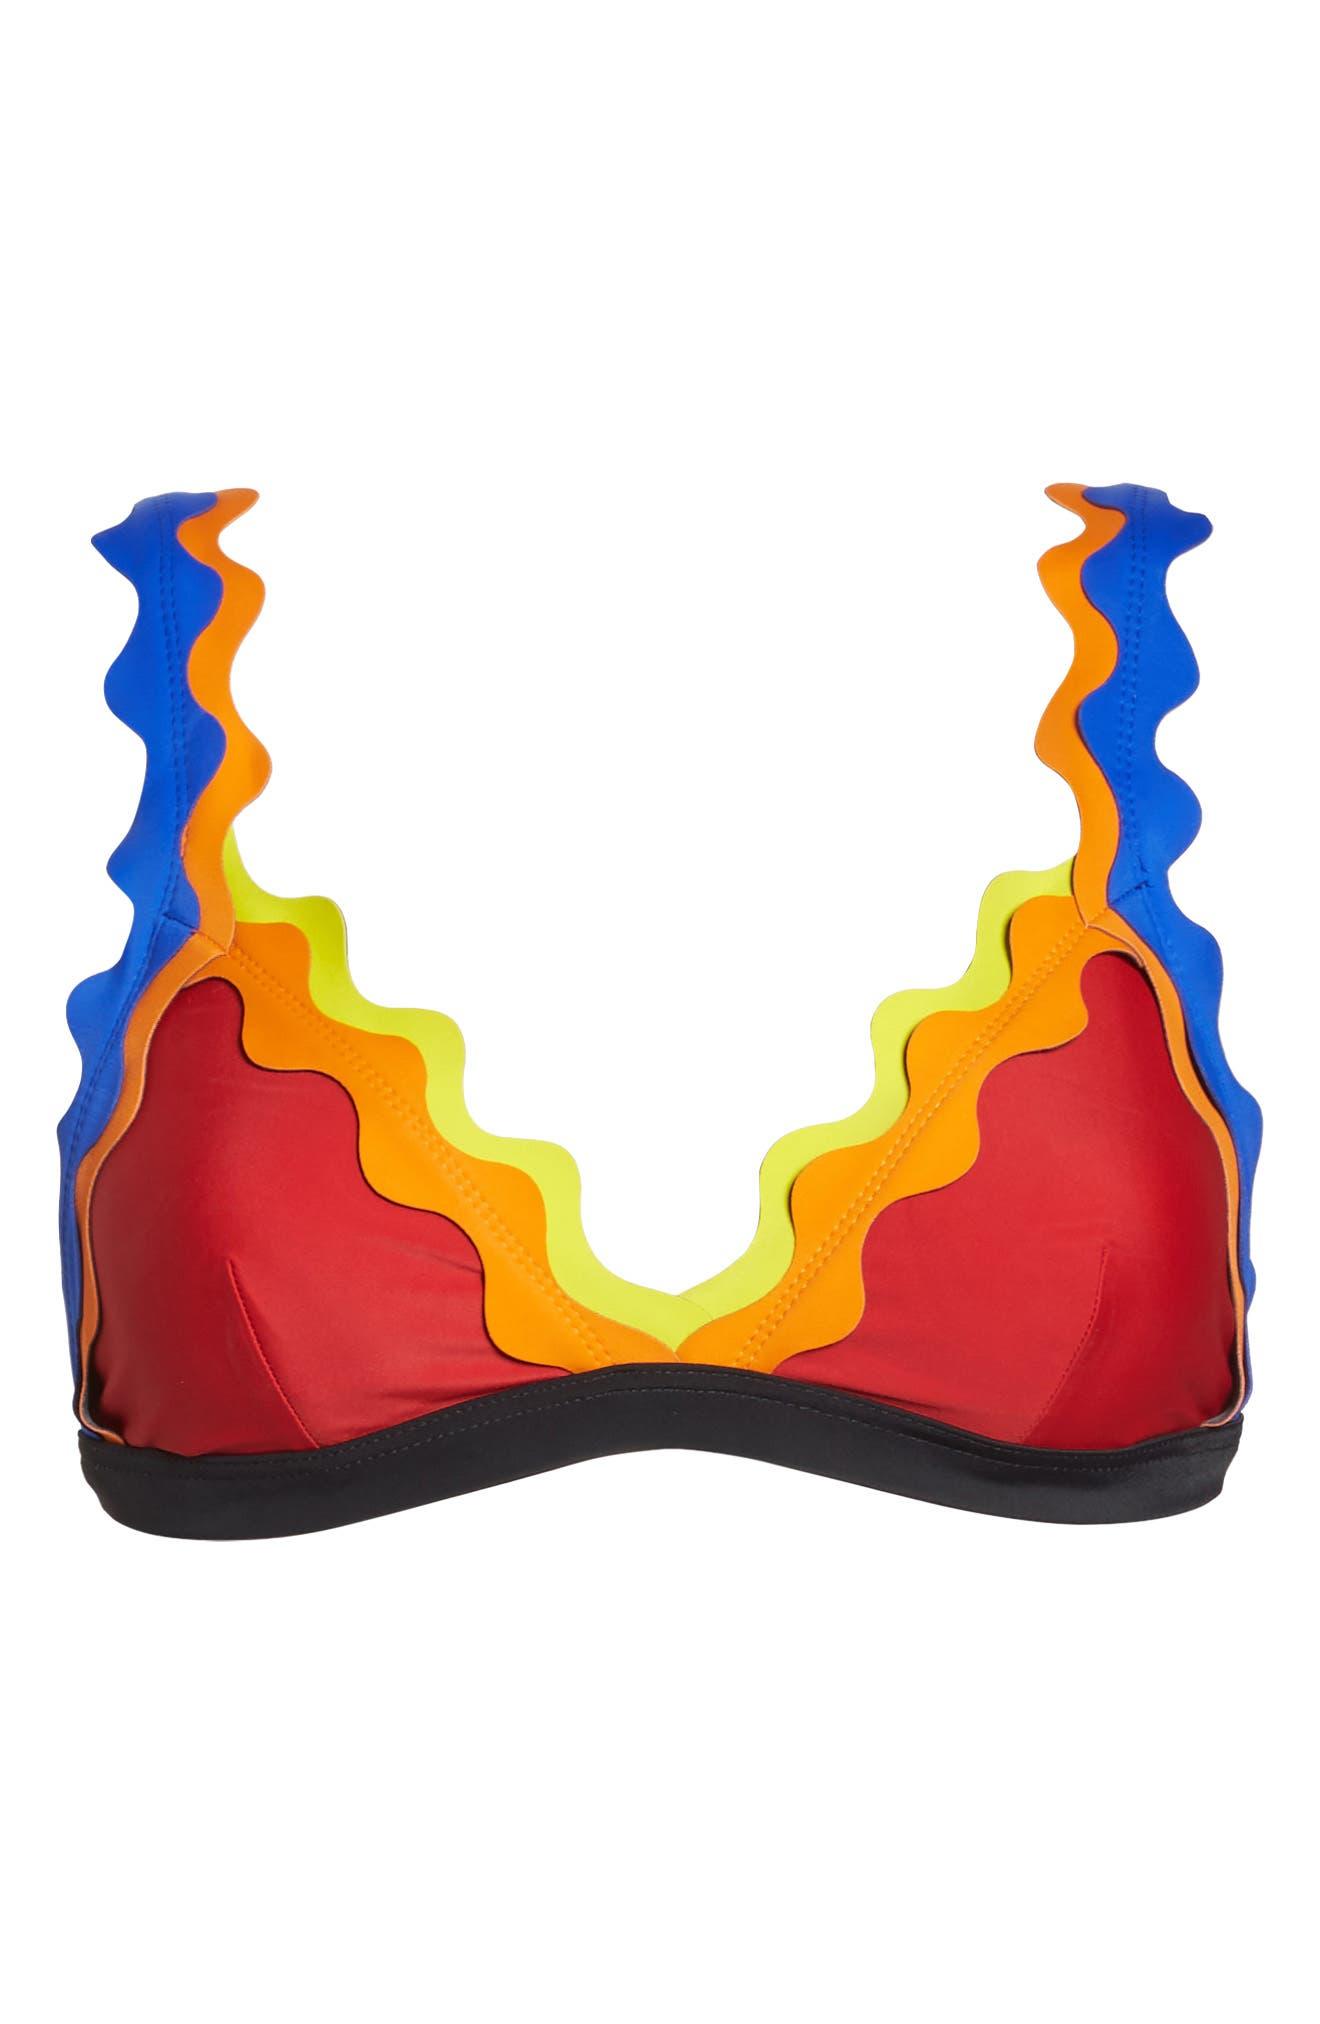 Cackle Scallop Bikini Top,                             Alternate thumbnail 9, color,                             Red